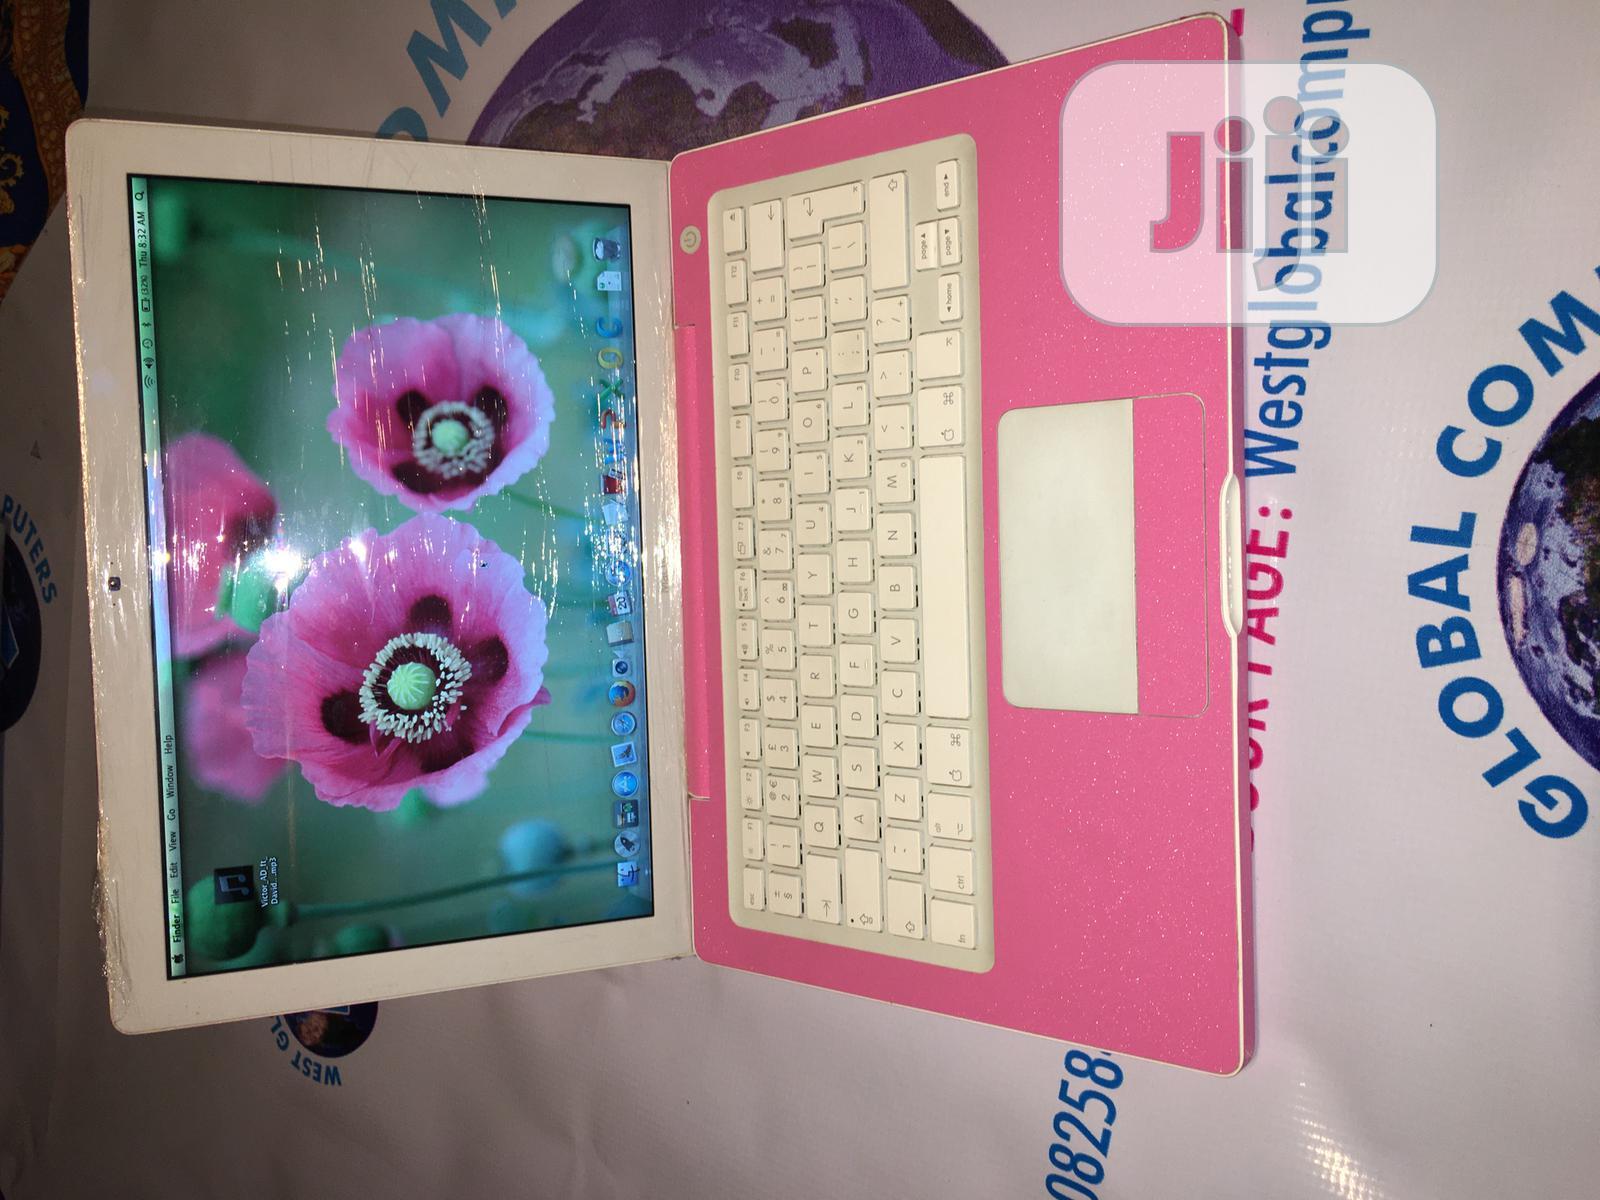 Laptop Apple MacBook 4GB Intel HDD 250GB | Laptops & Computers for sale in Lekki, Lagos State, Nigeria